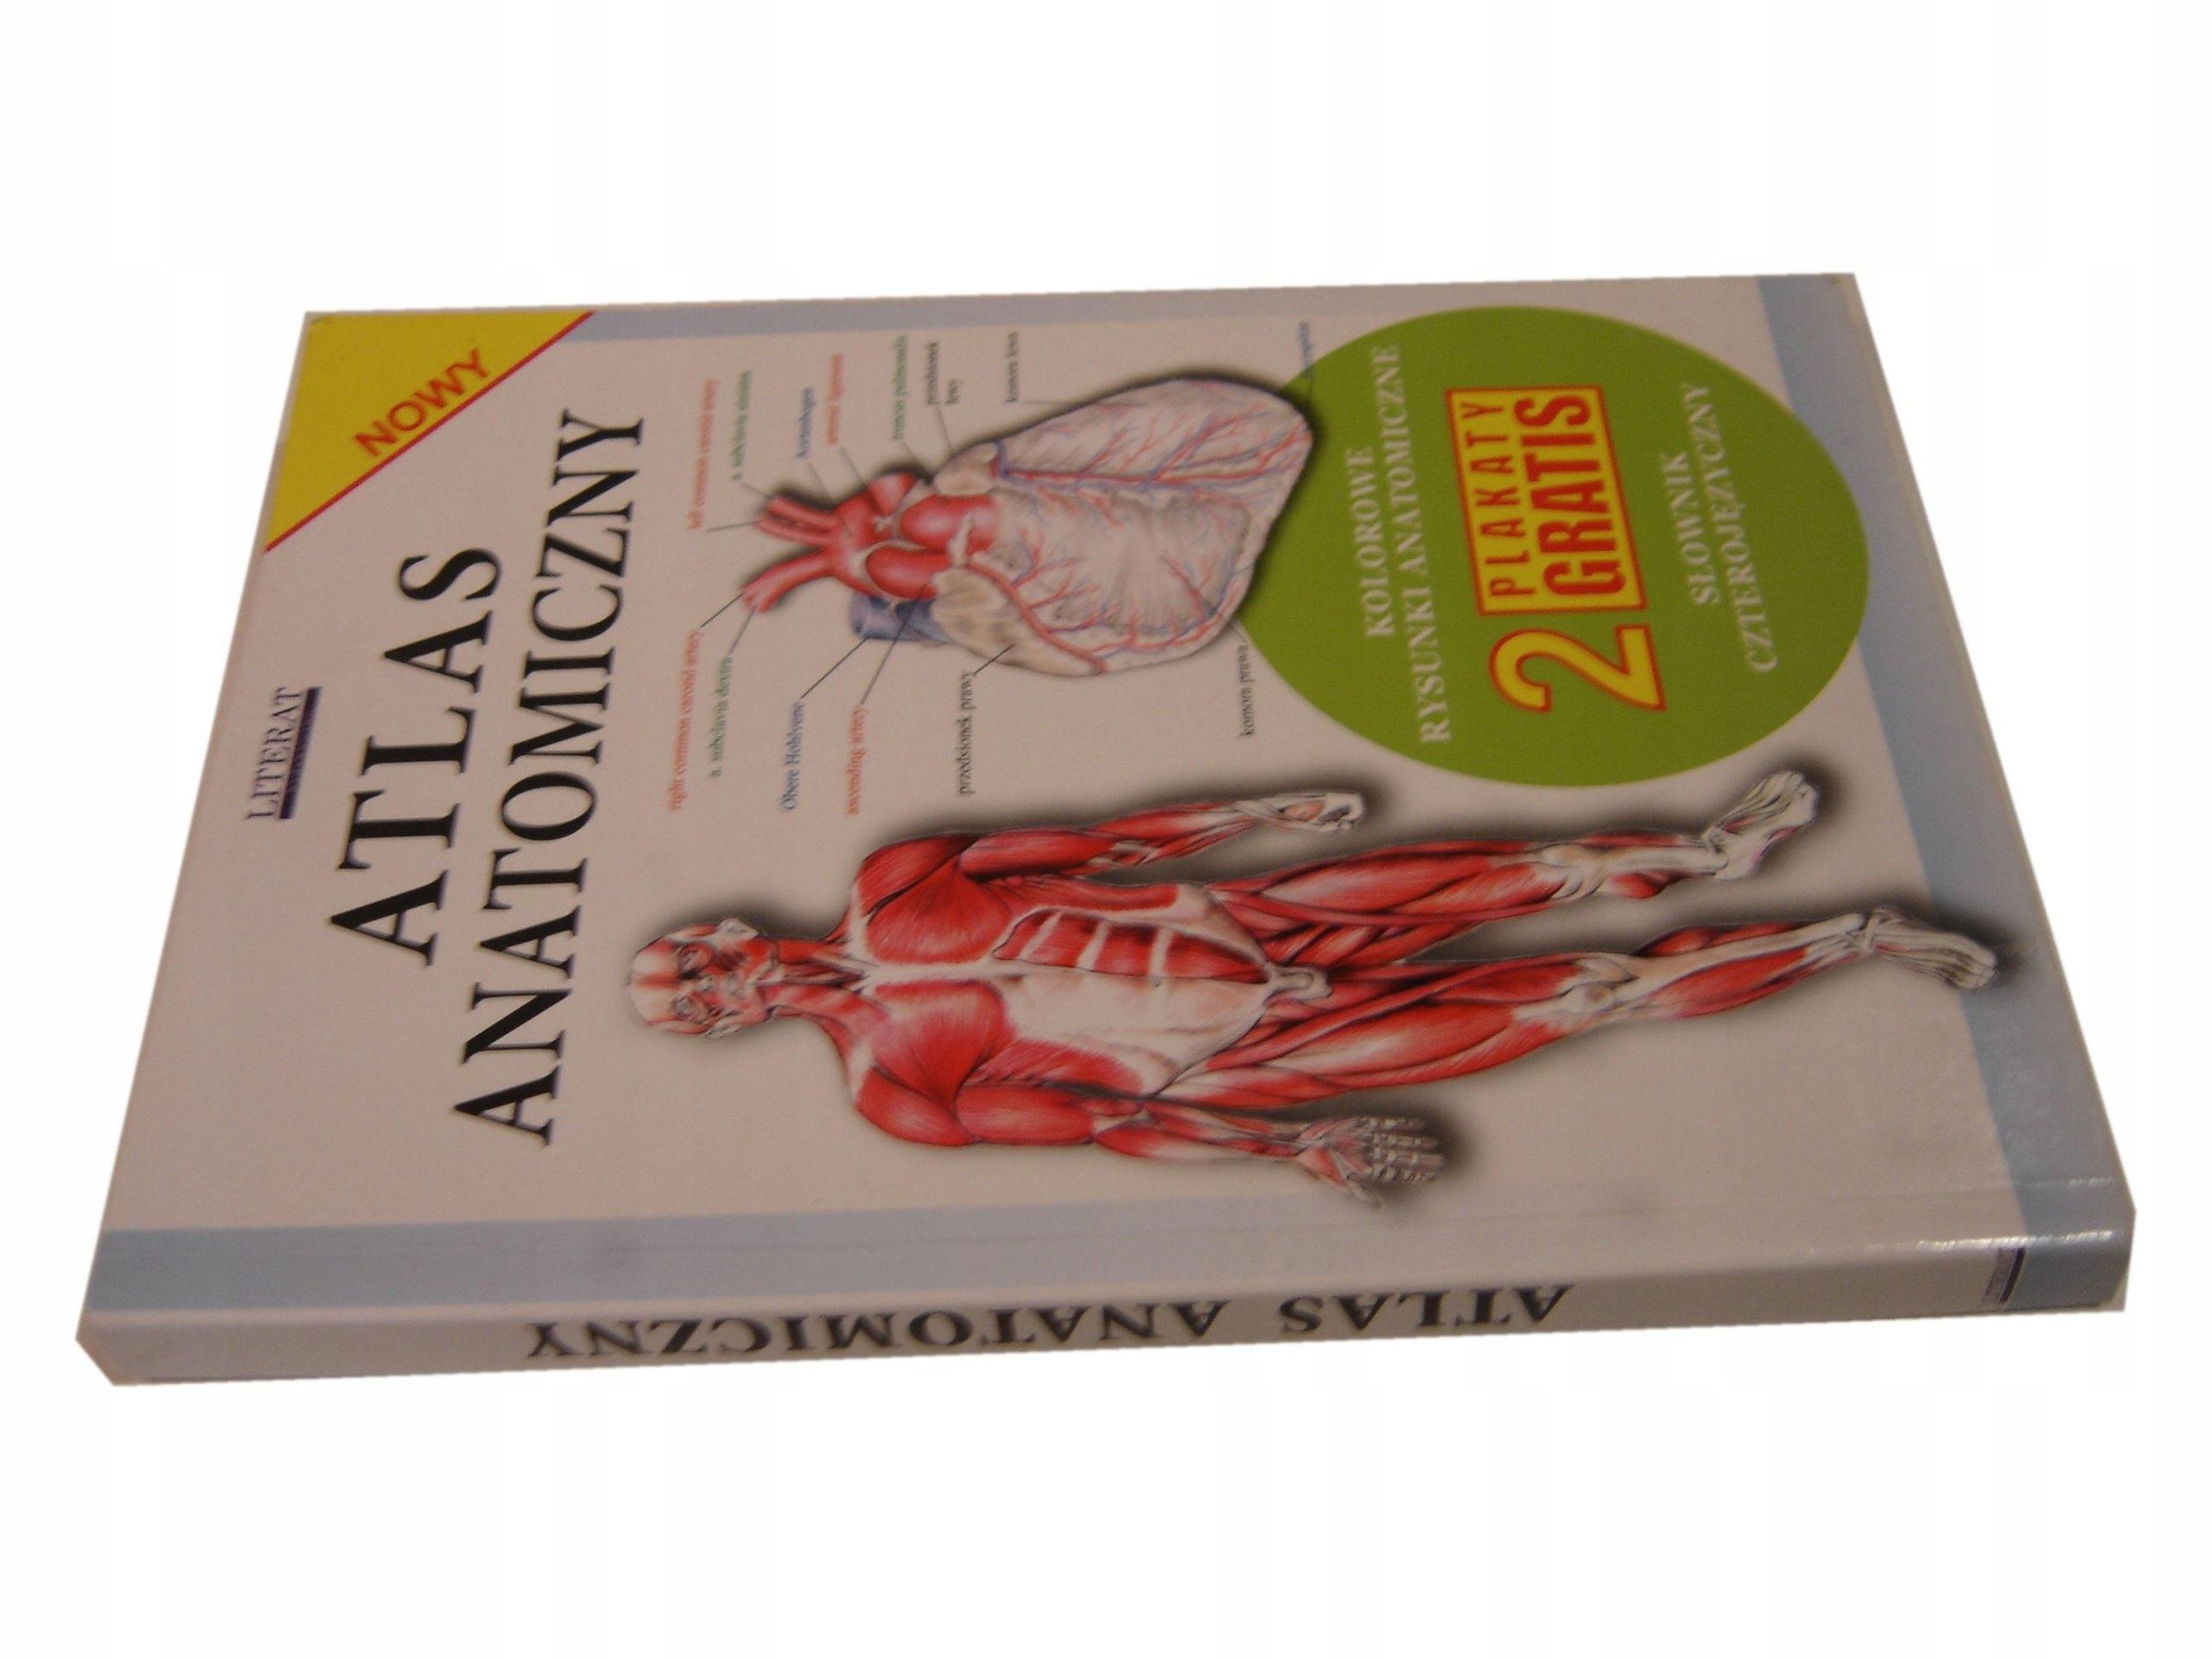 Atlas Anatomiczny Literat 7185203230 Oficjalne